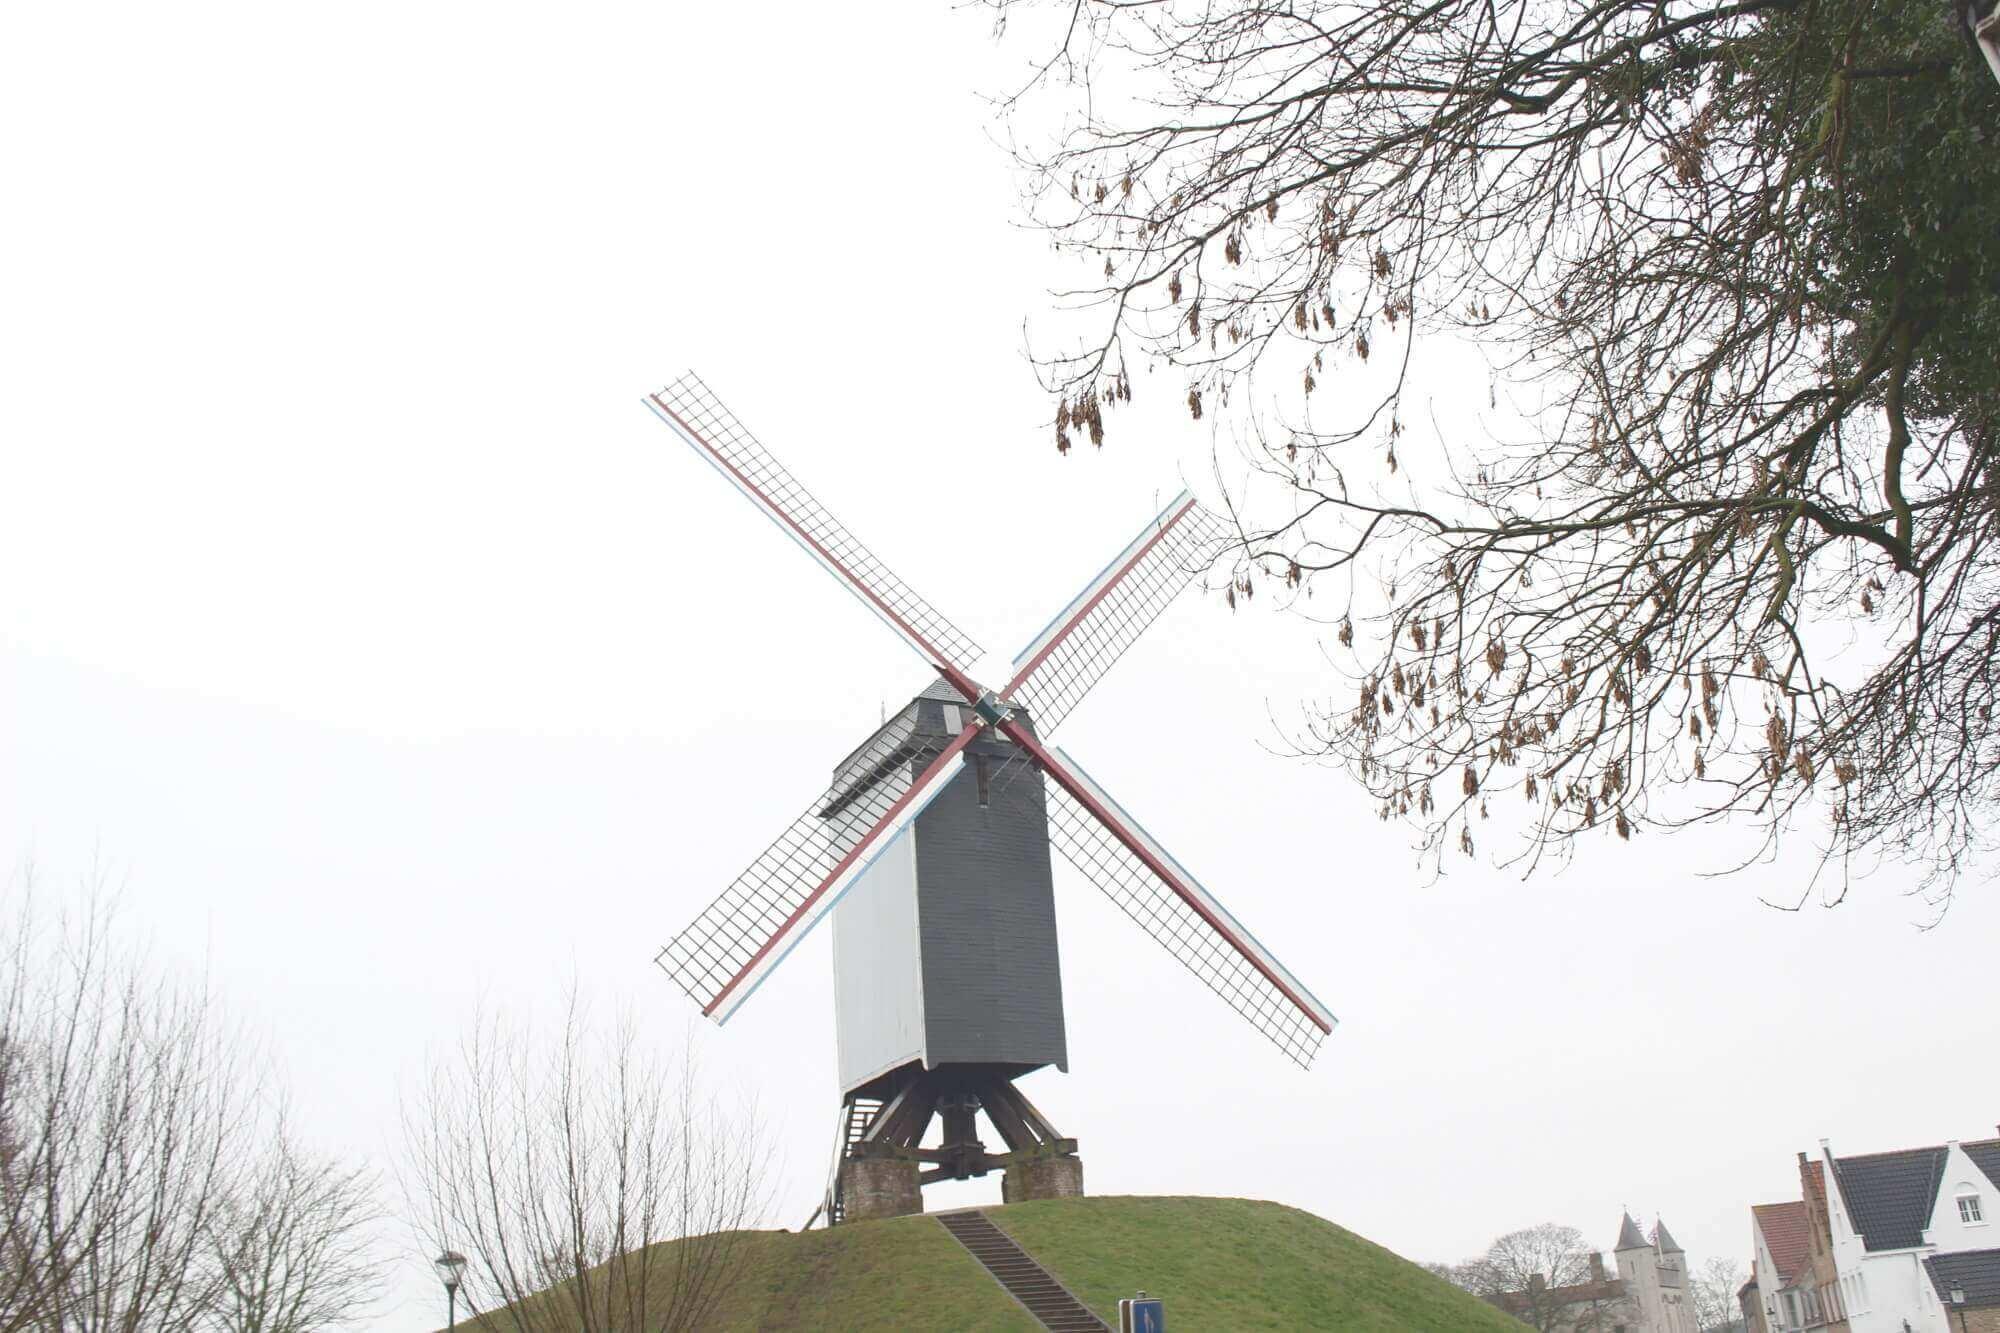 Windmühle auf Hügel in Brügge, Belgien